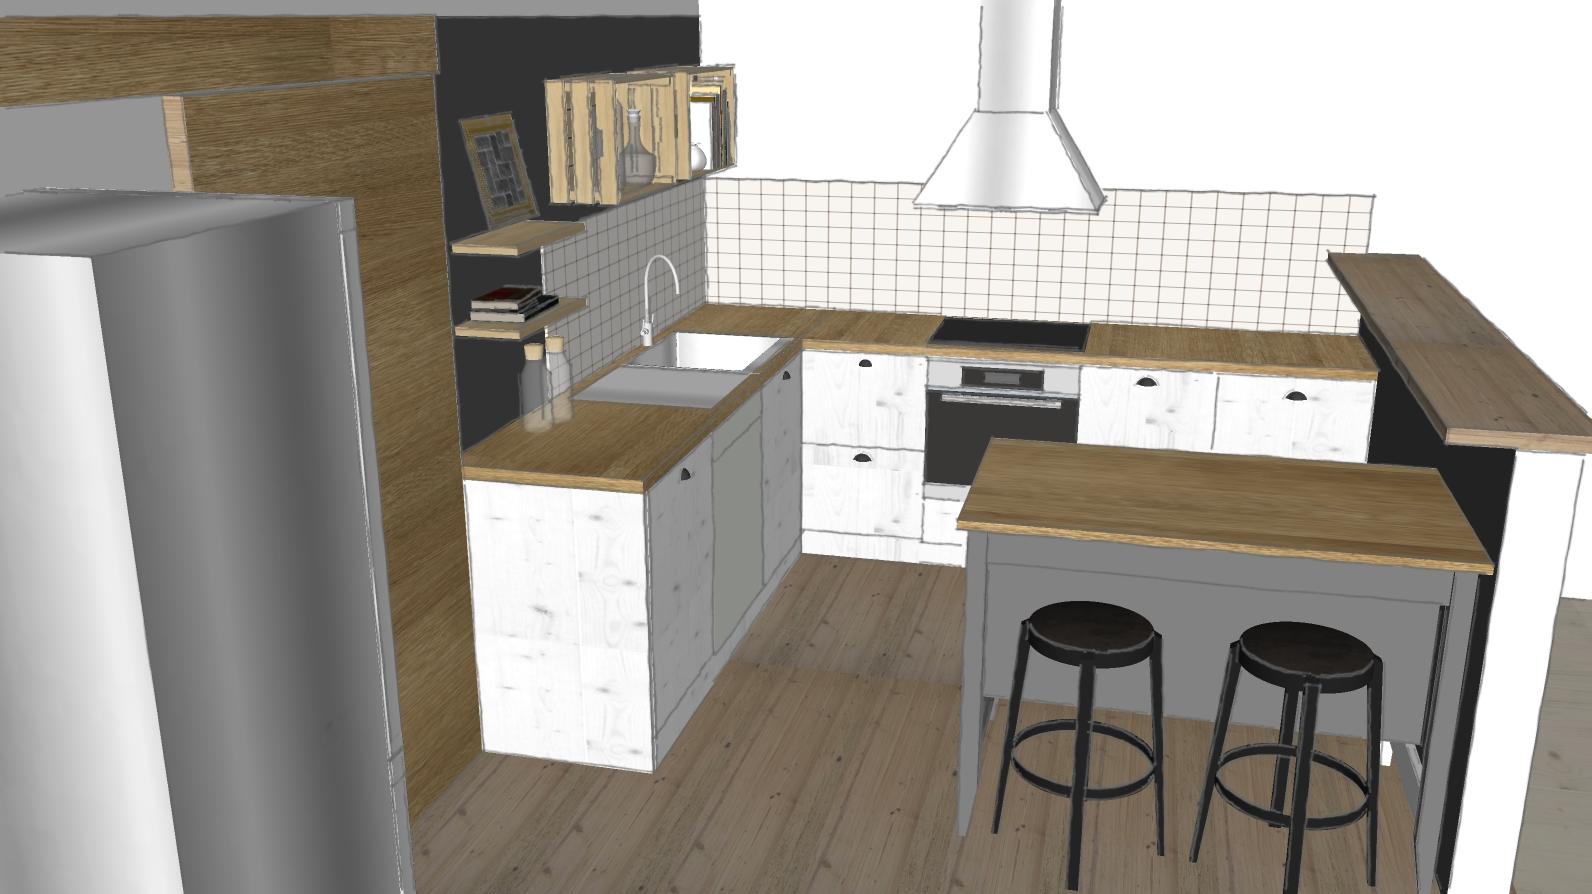 Wurzelwerk Küchengestaltung Planung